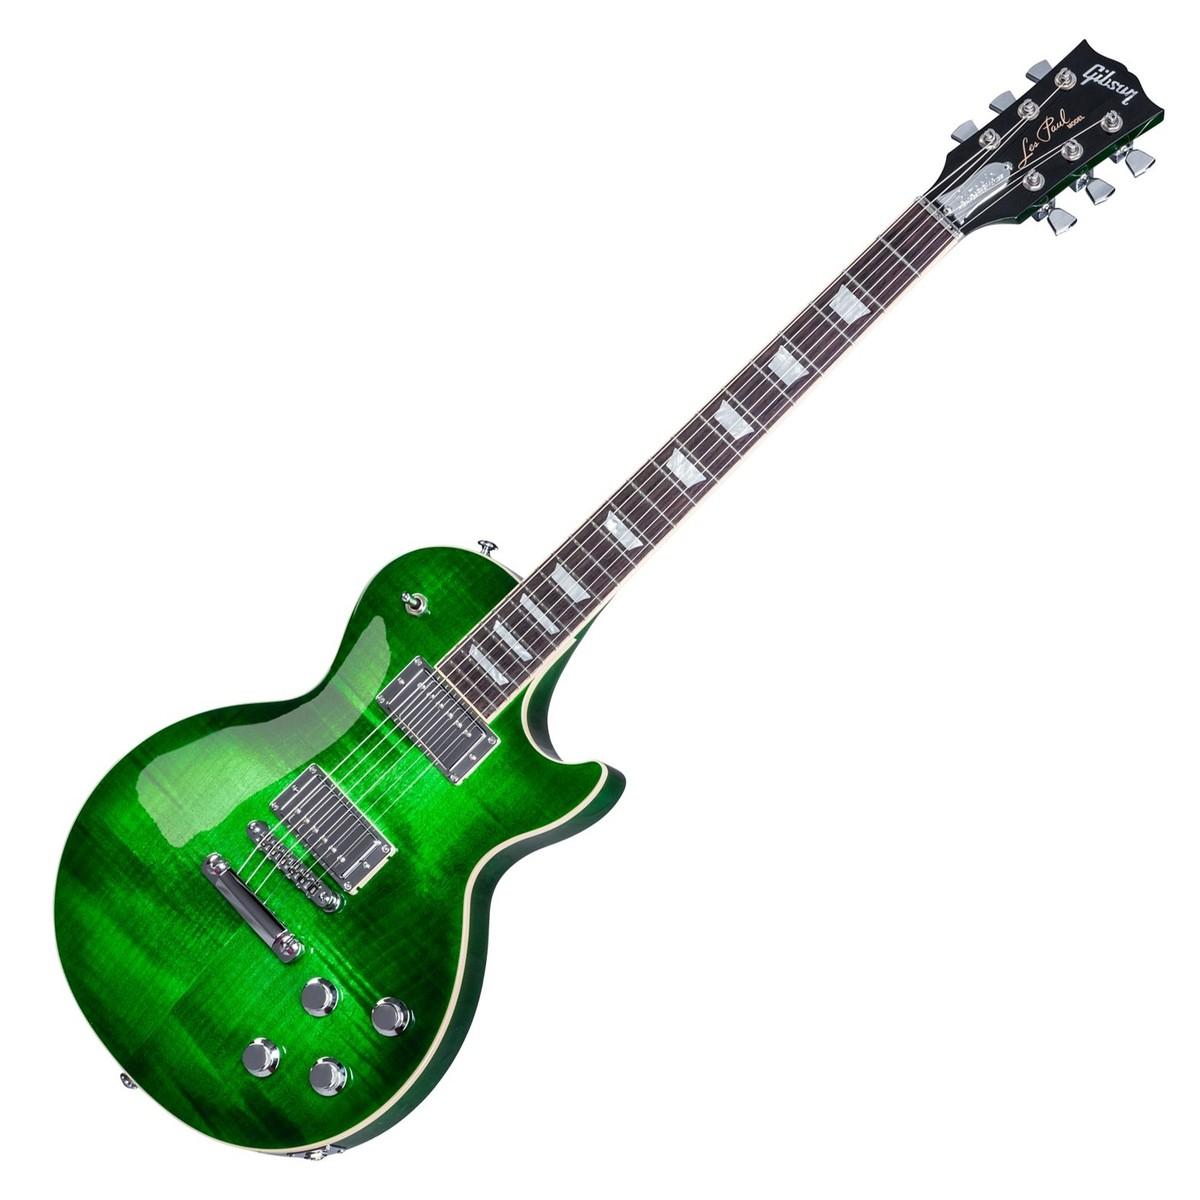 gibson les paul classic hp electric guitar green ocean burst 2017 at. Black Bedroom Furniture Sets. Home Design Ideas